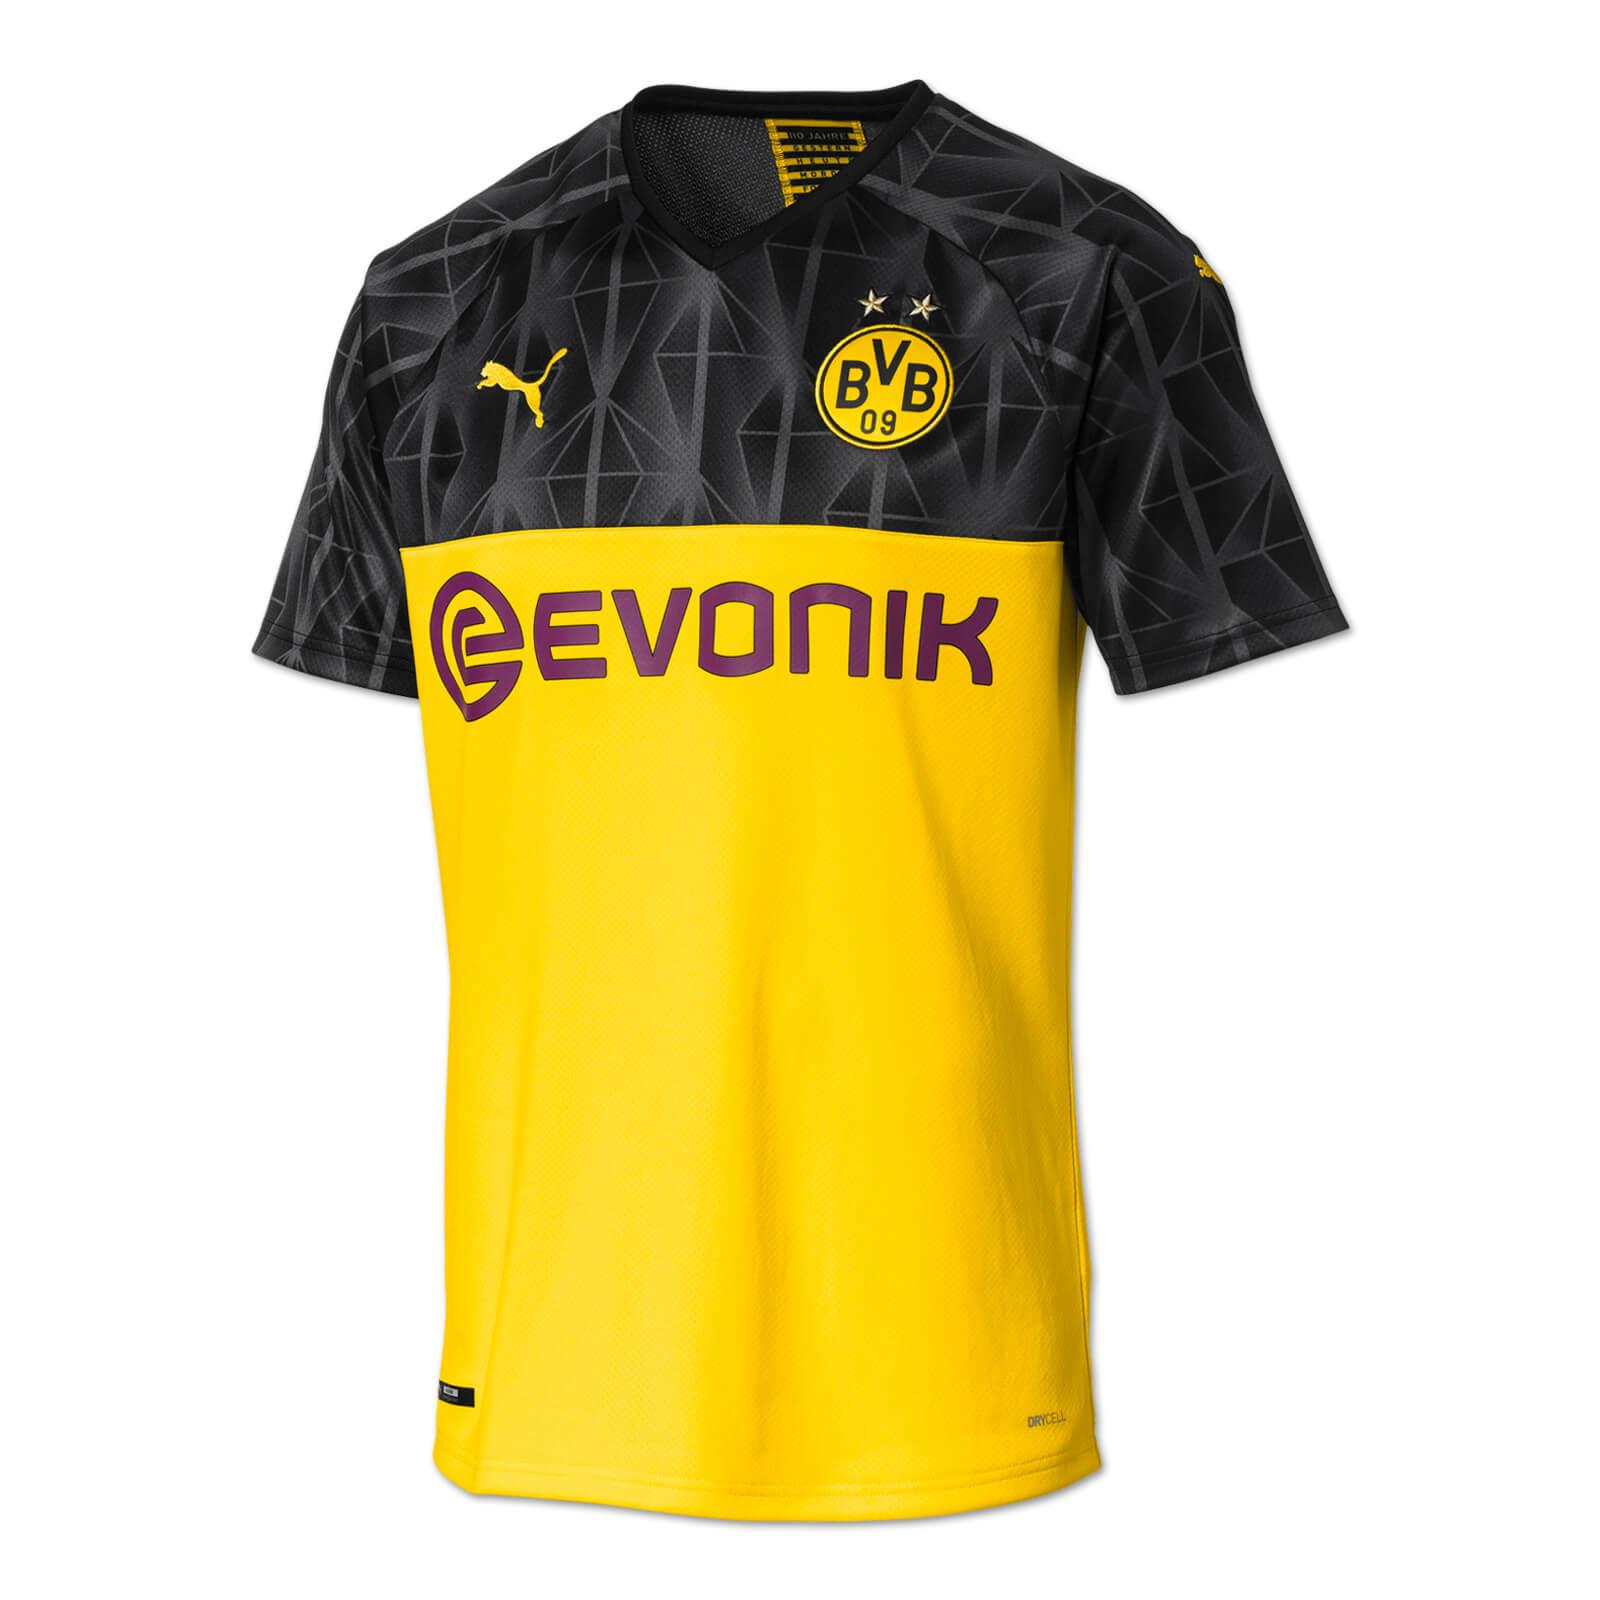 BVB Borussia Dortmund Trikot 19/20 inkl. Spielerflock 39,99€ & Porto ab 50€ Versandkostenfrei